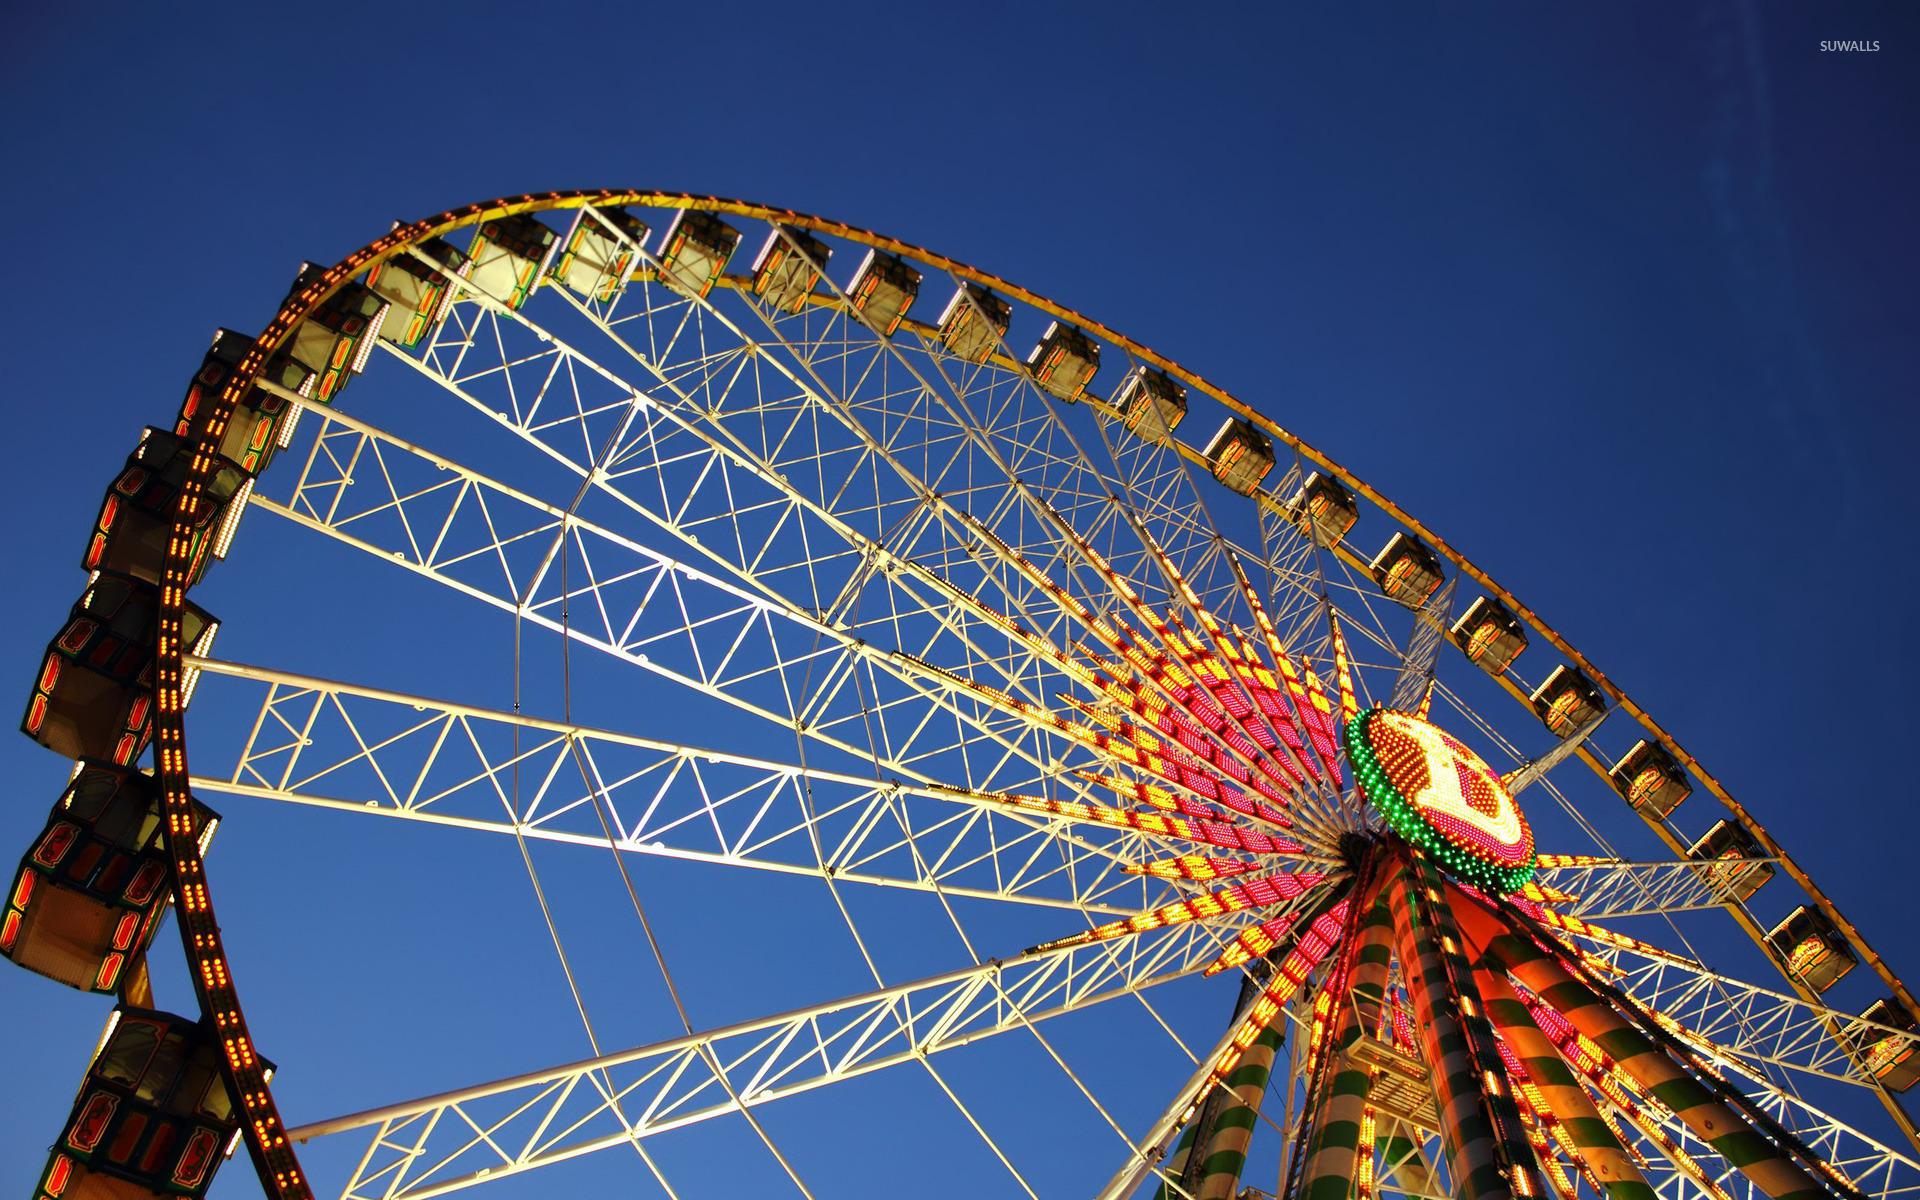 Ferris Wheel Wallpaper Photography Wallpapers 17703 Fence ferris wheel 4k hd photography